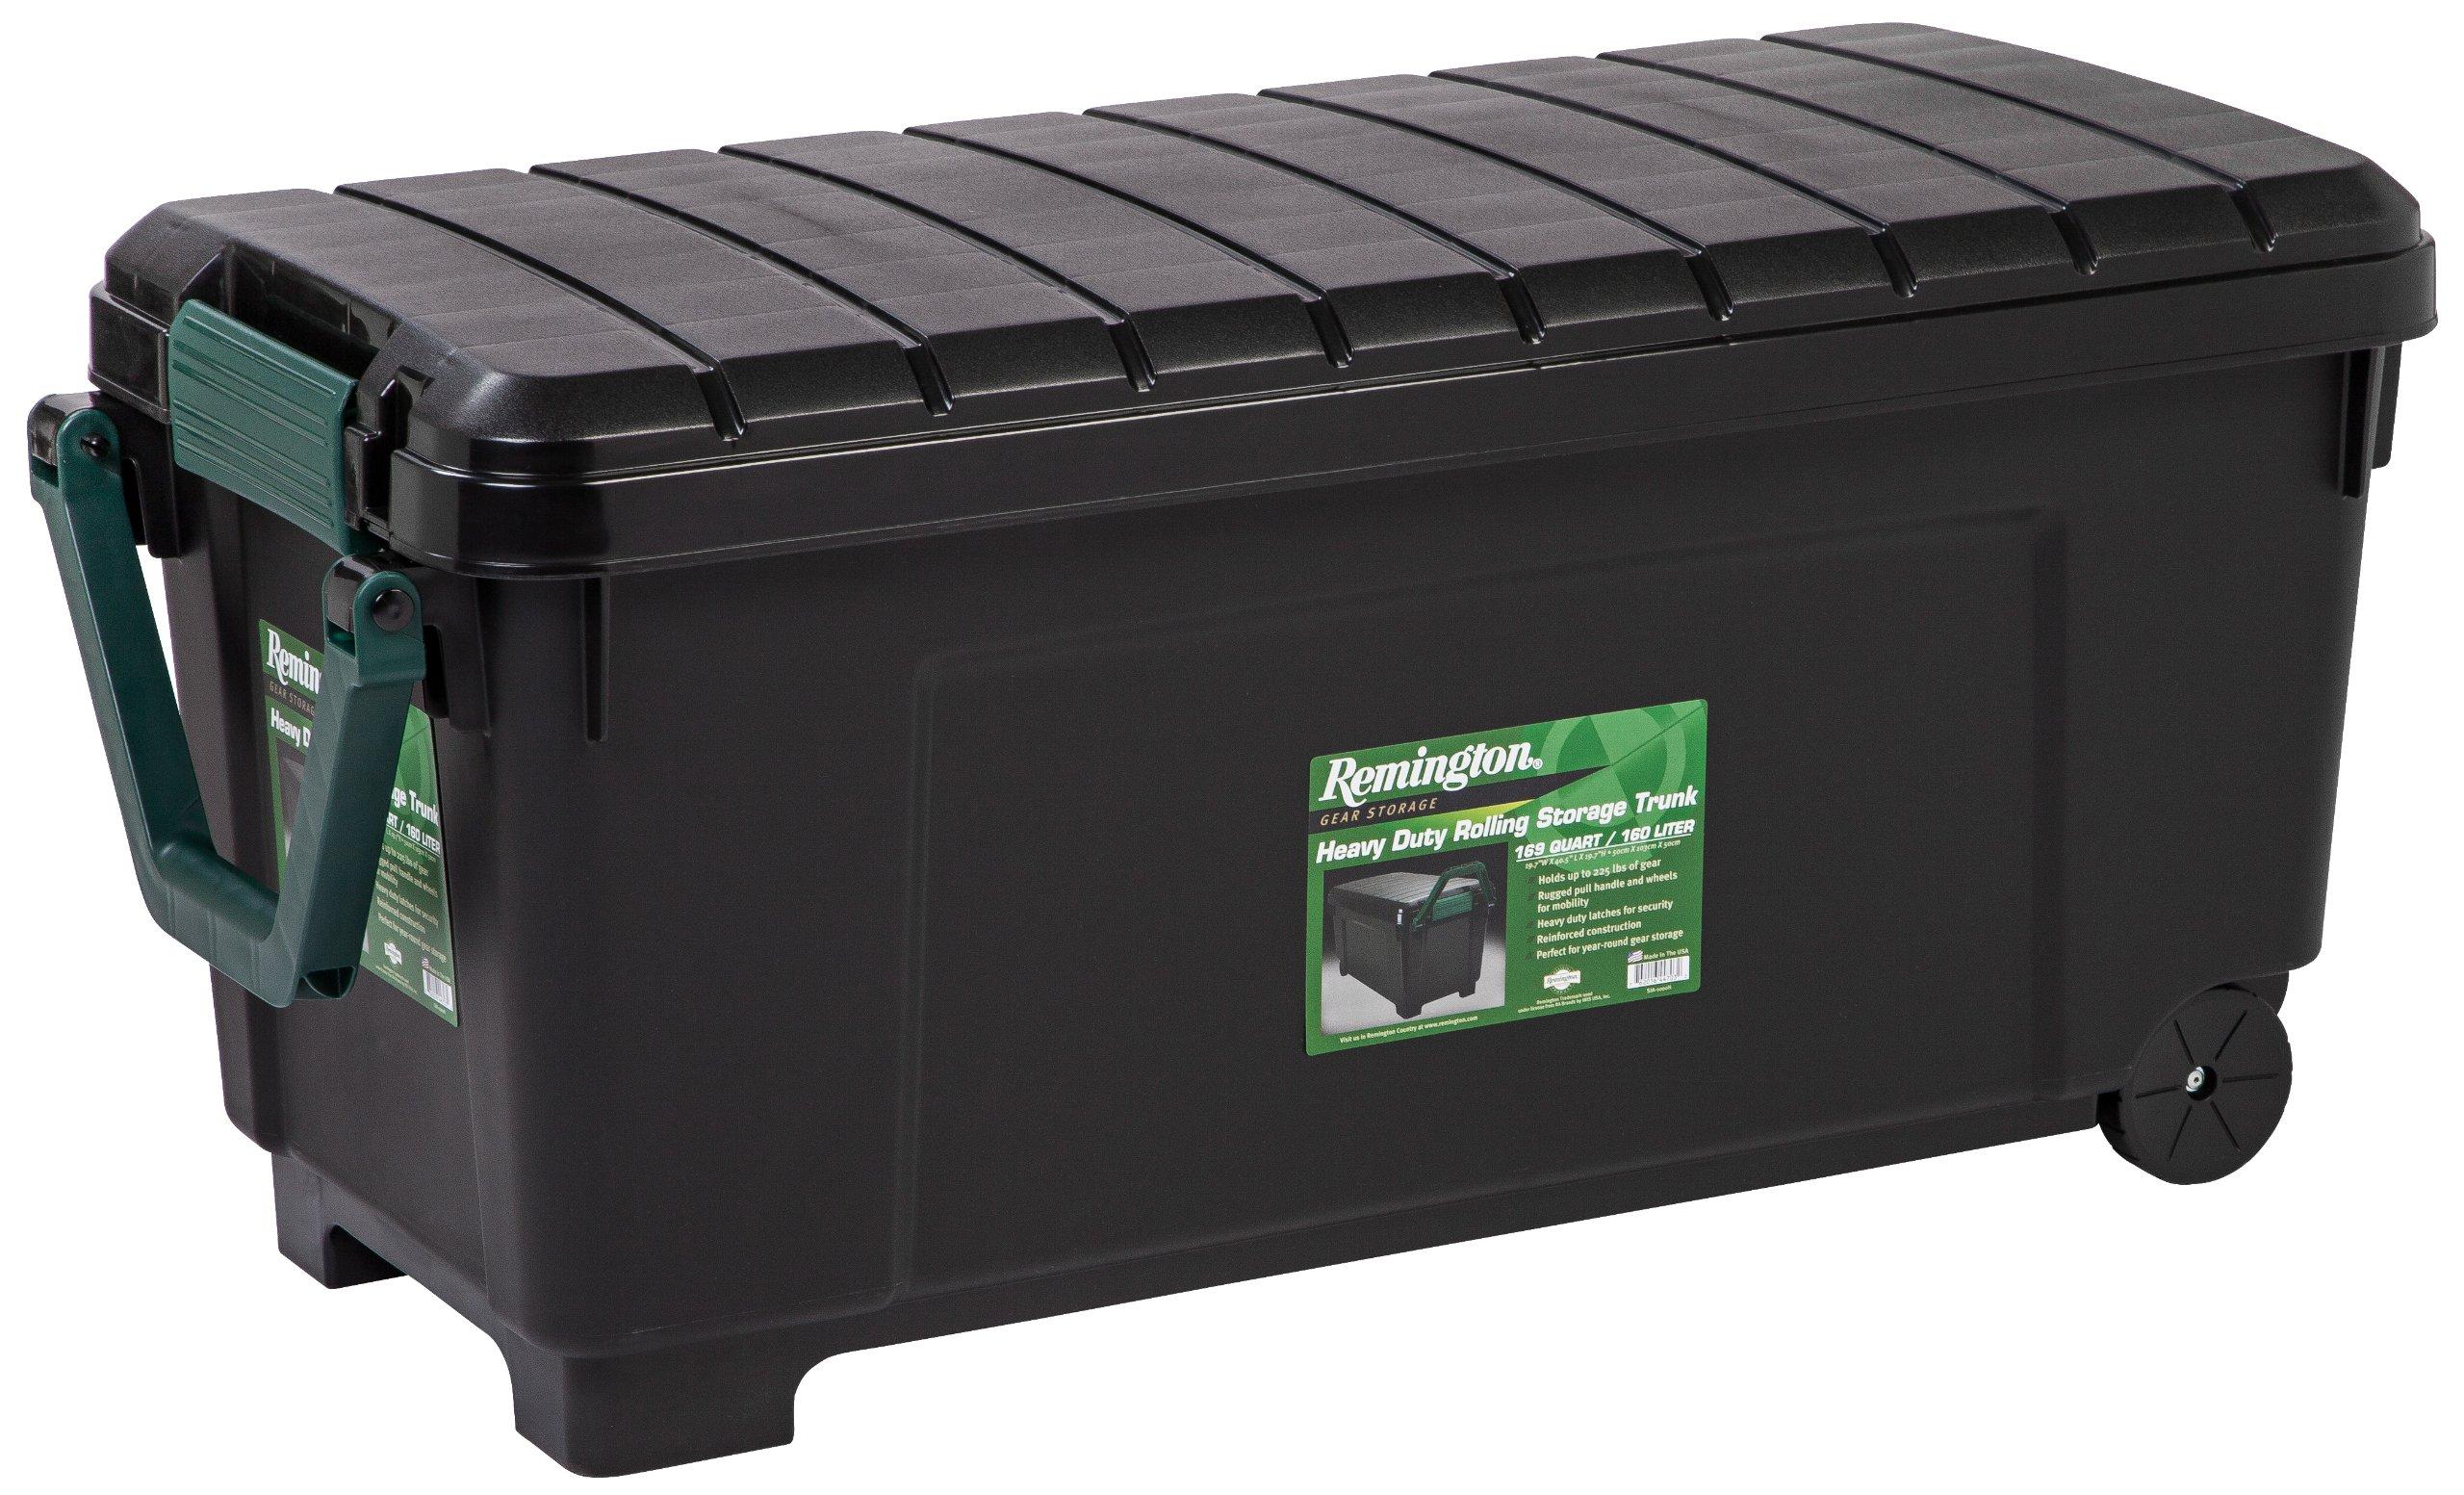 IRIS USA, Inc. Remington Heavy Duty Rolling Tote - 42.25 Gallon (1-(Pack)) by IRIS USA, Inc.